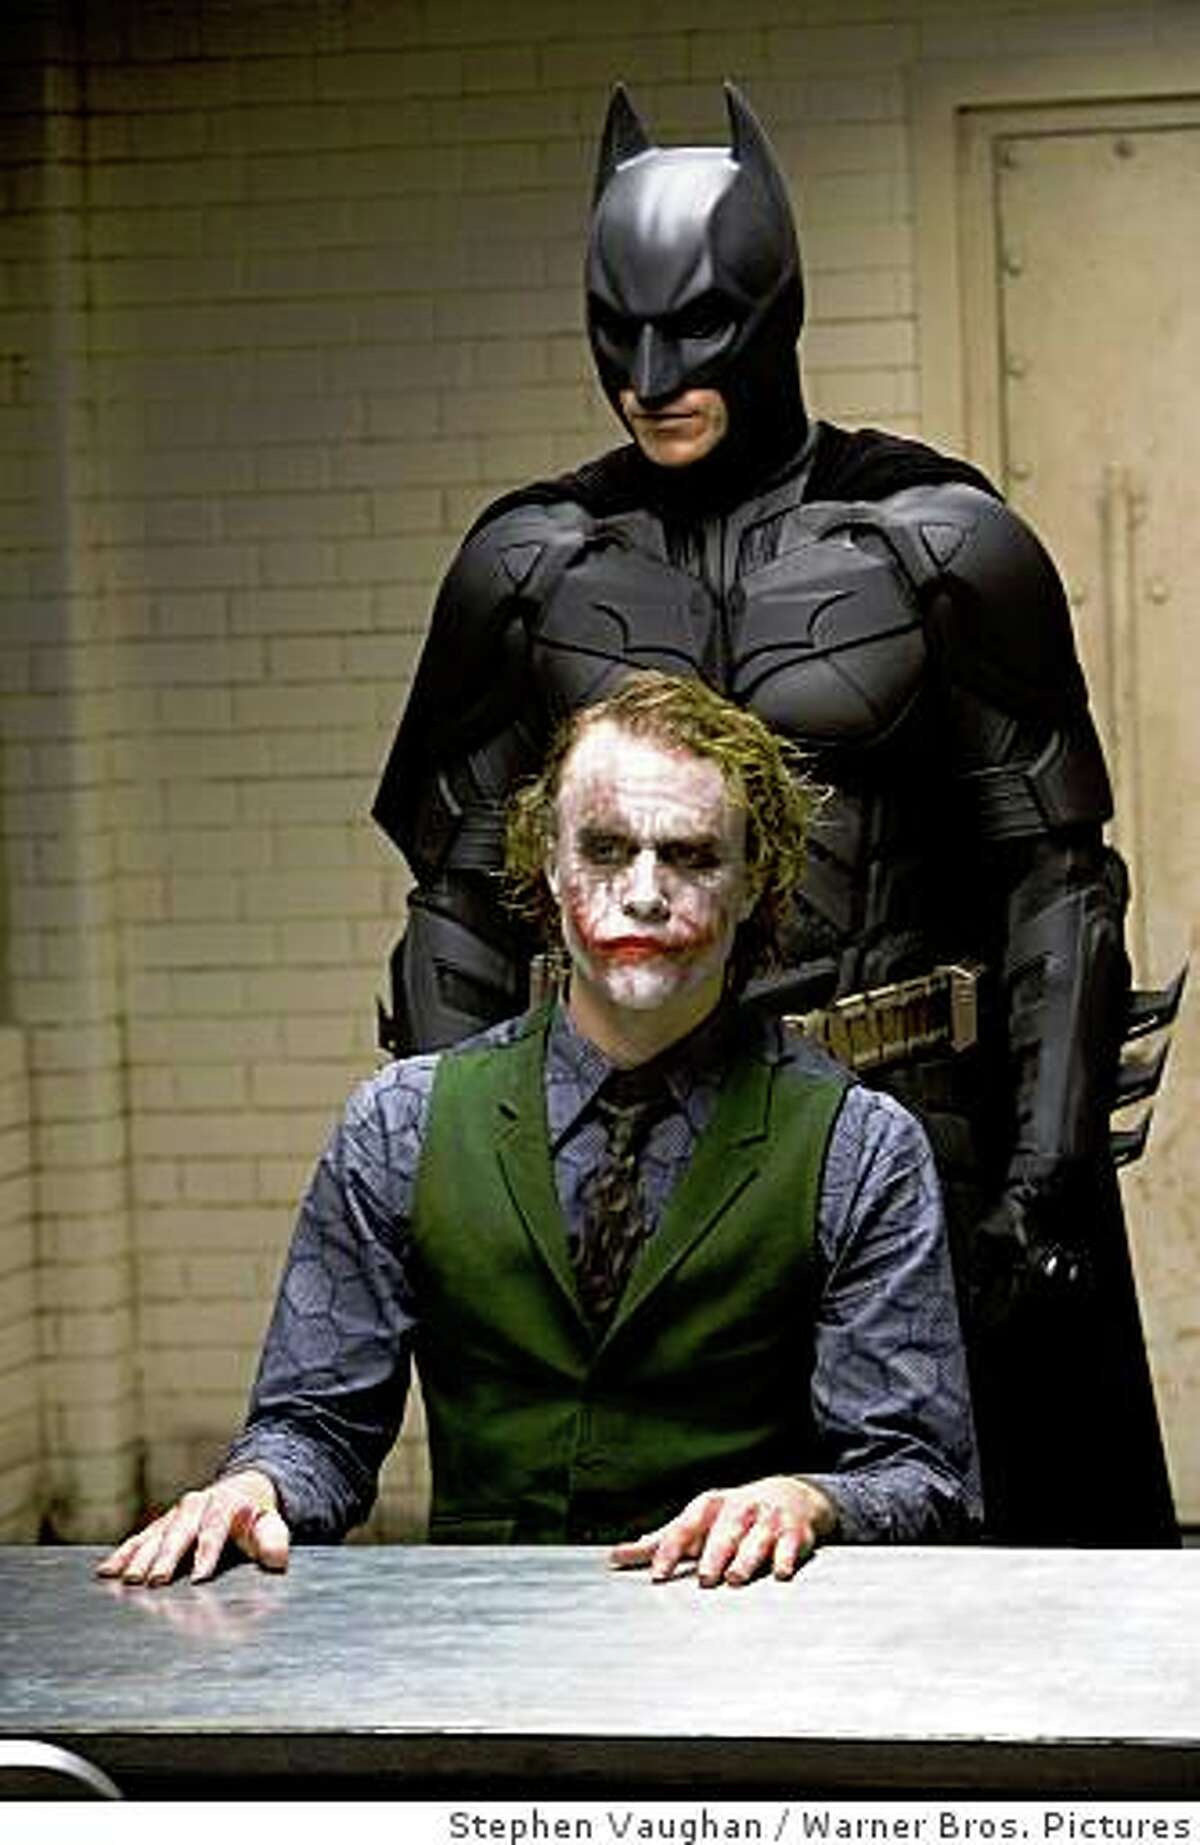 Heath Ledger as the Joker and Christian Bale as Batman in